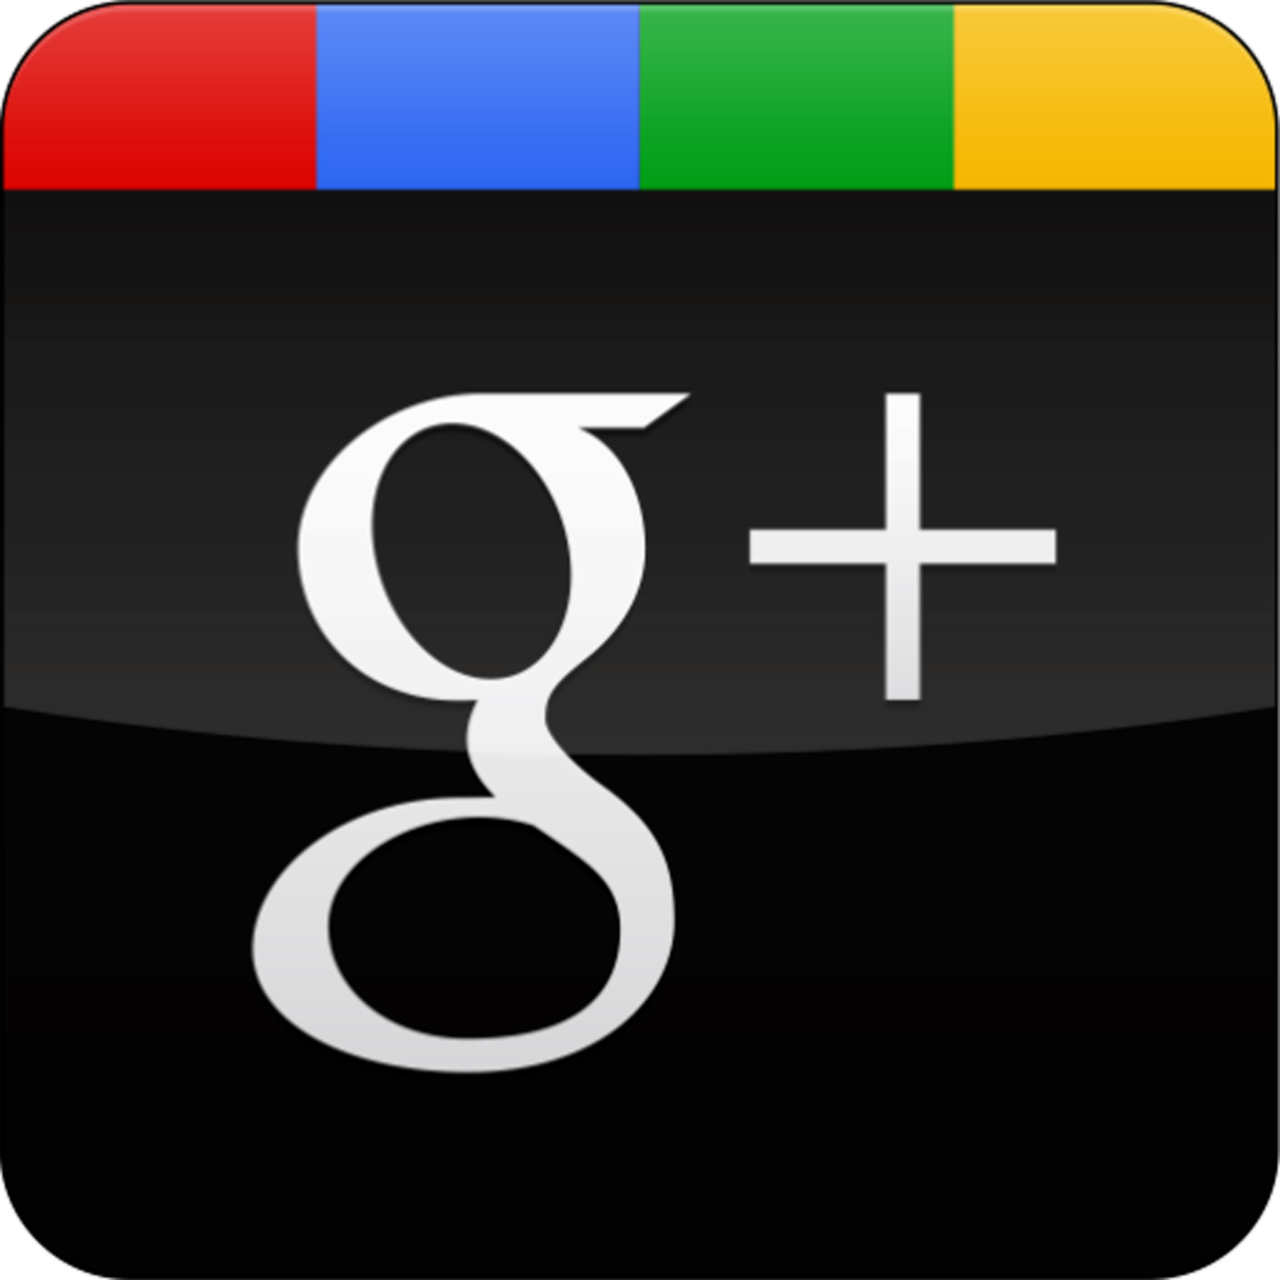 google plus g hd logo wallpaper hd wallpapers